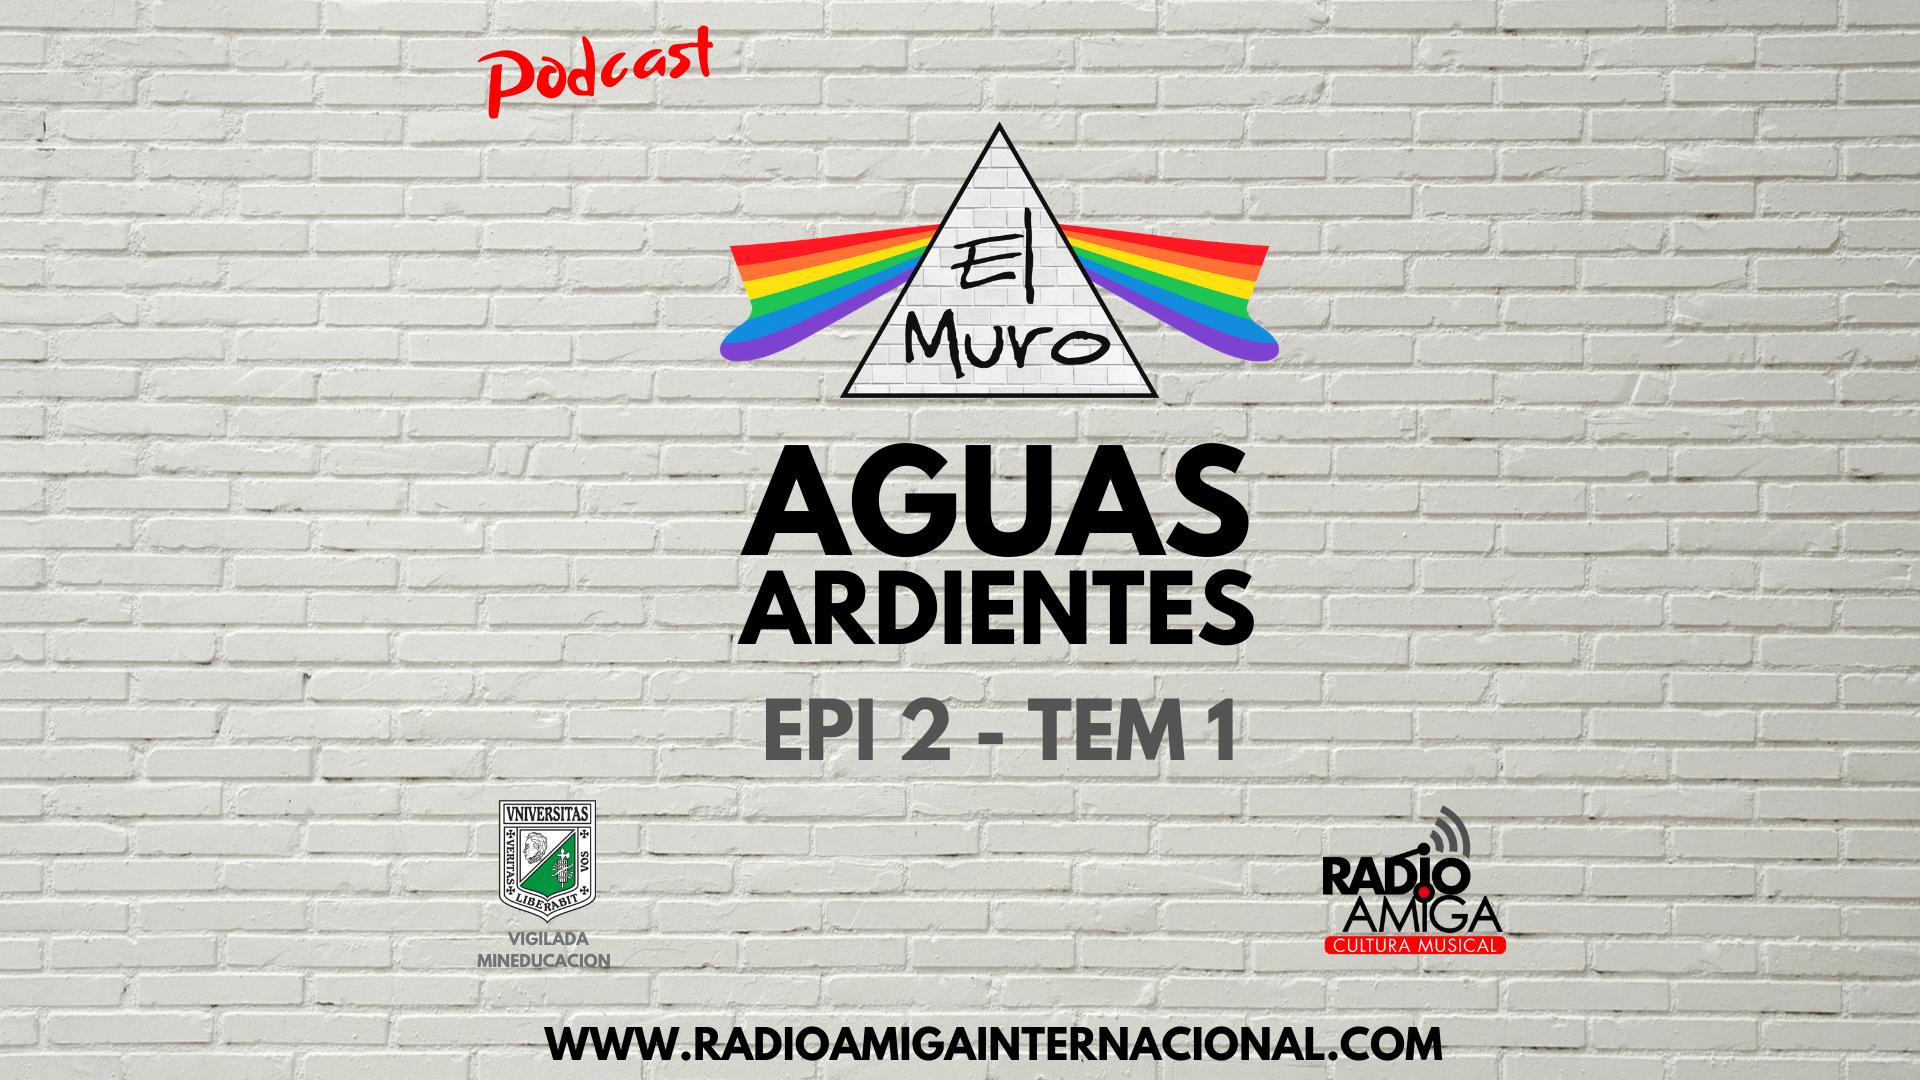 radioamiga, radio, free, online, music